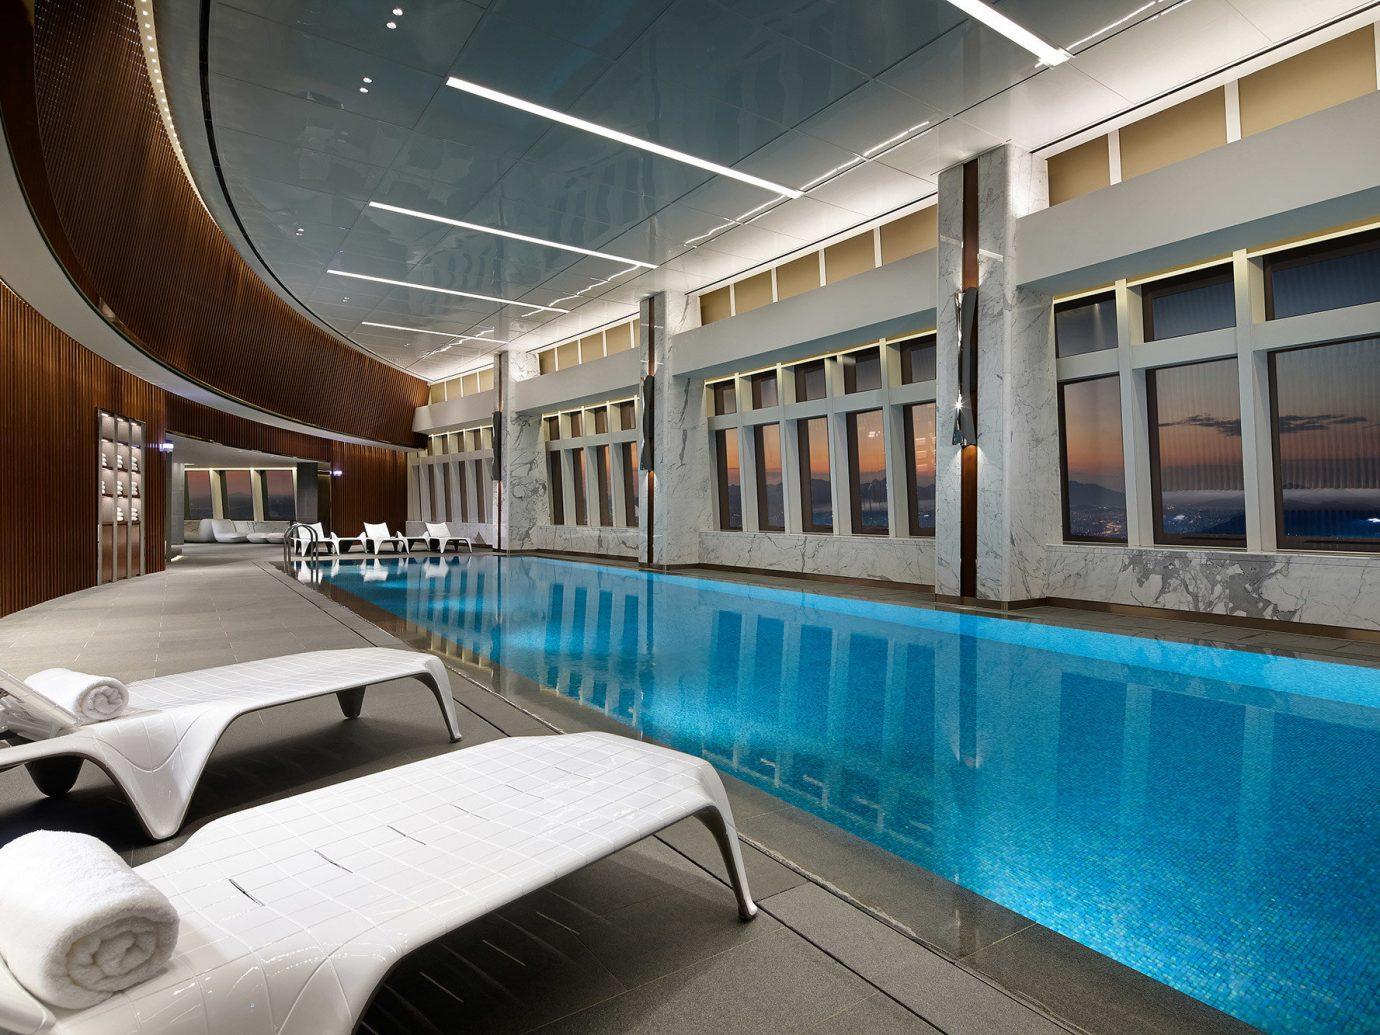 Hotels Luxury Travel indoor floor swimming pool Architecture leisure centre leisure interior design estate window amenity hotel